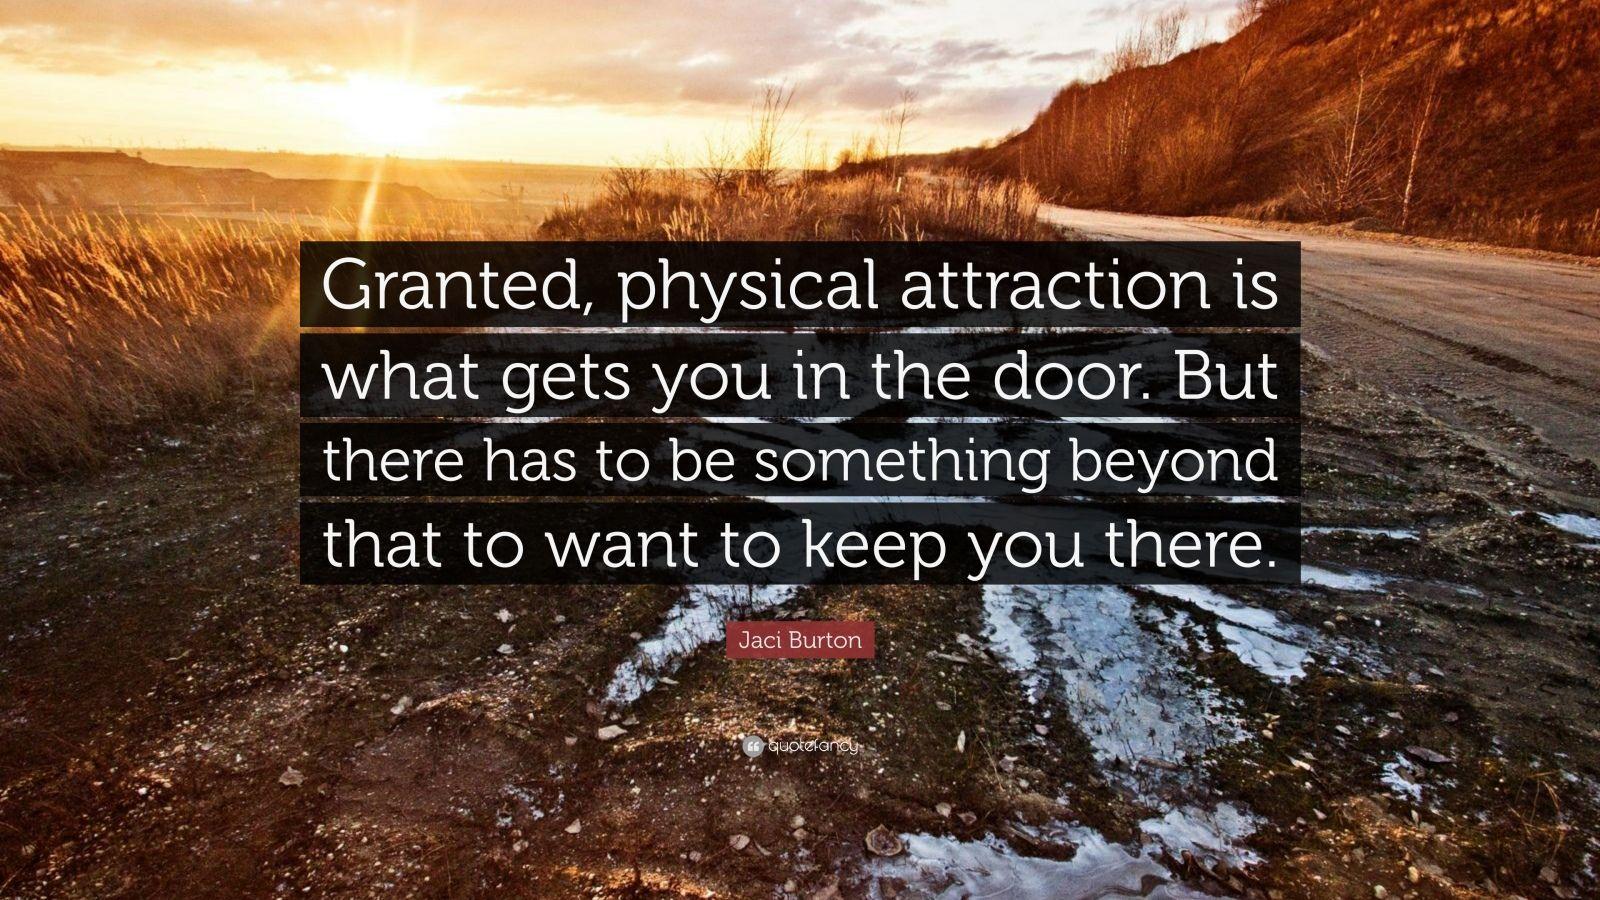 Jaci Burton Quotes (31 wallpapers) - Quotefancy